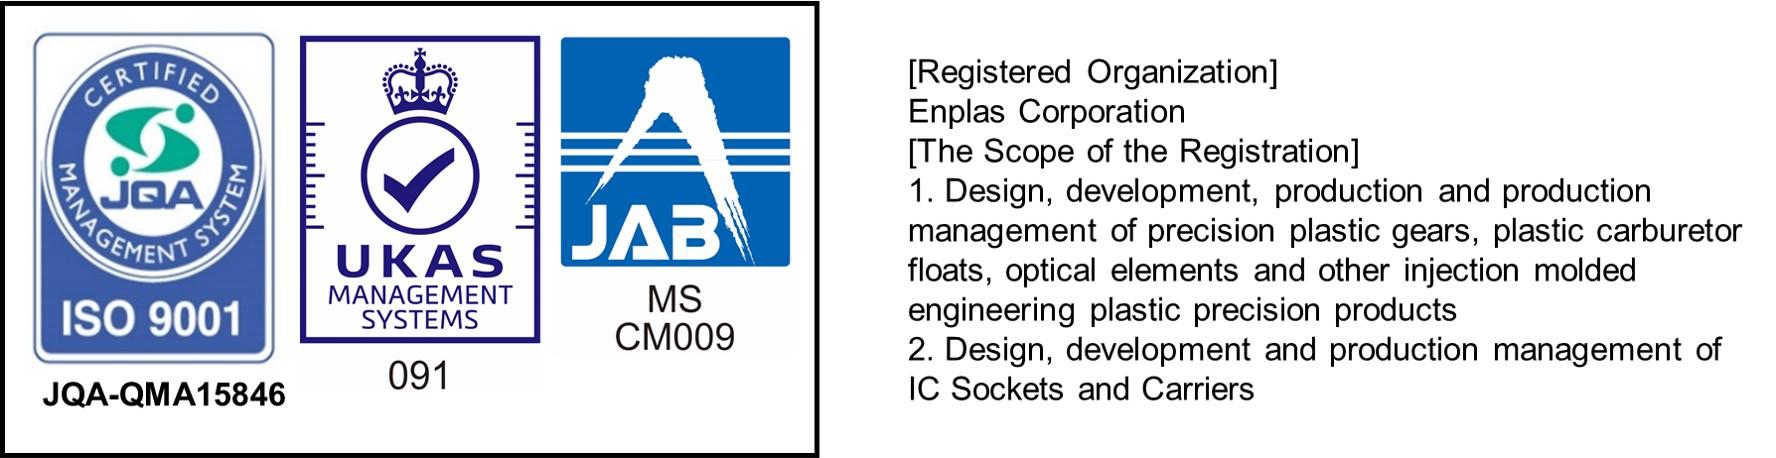 Scope of Registration